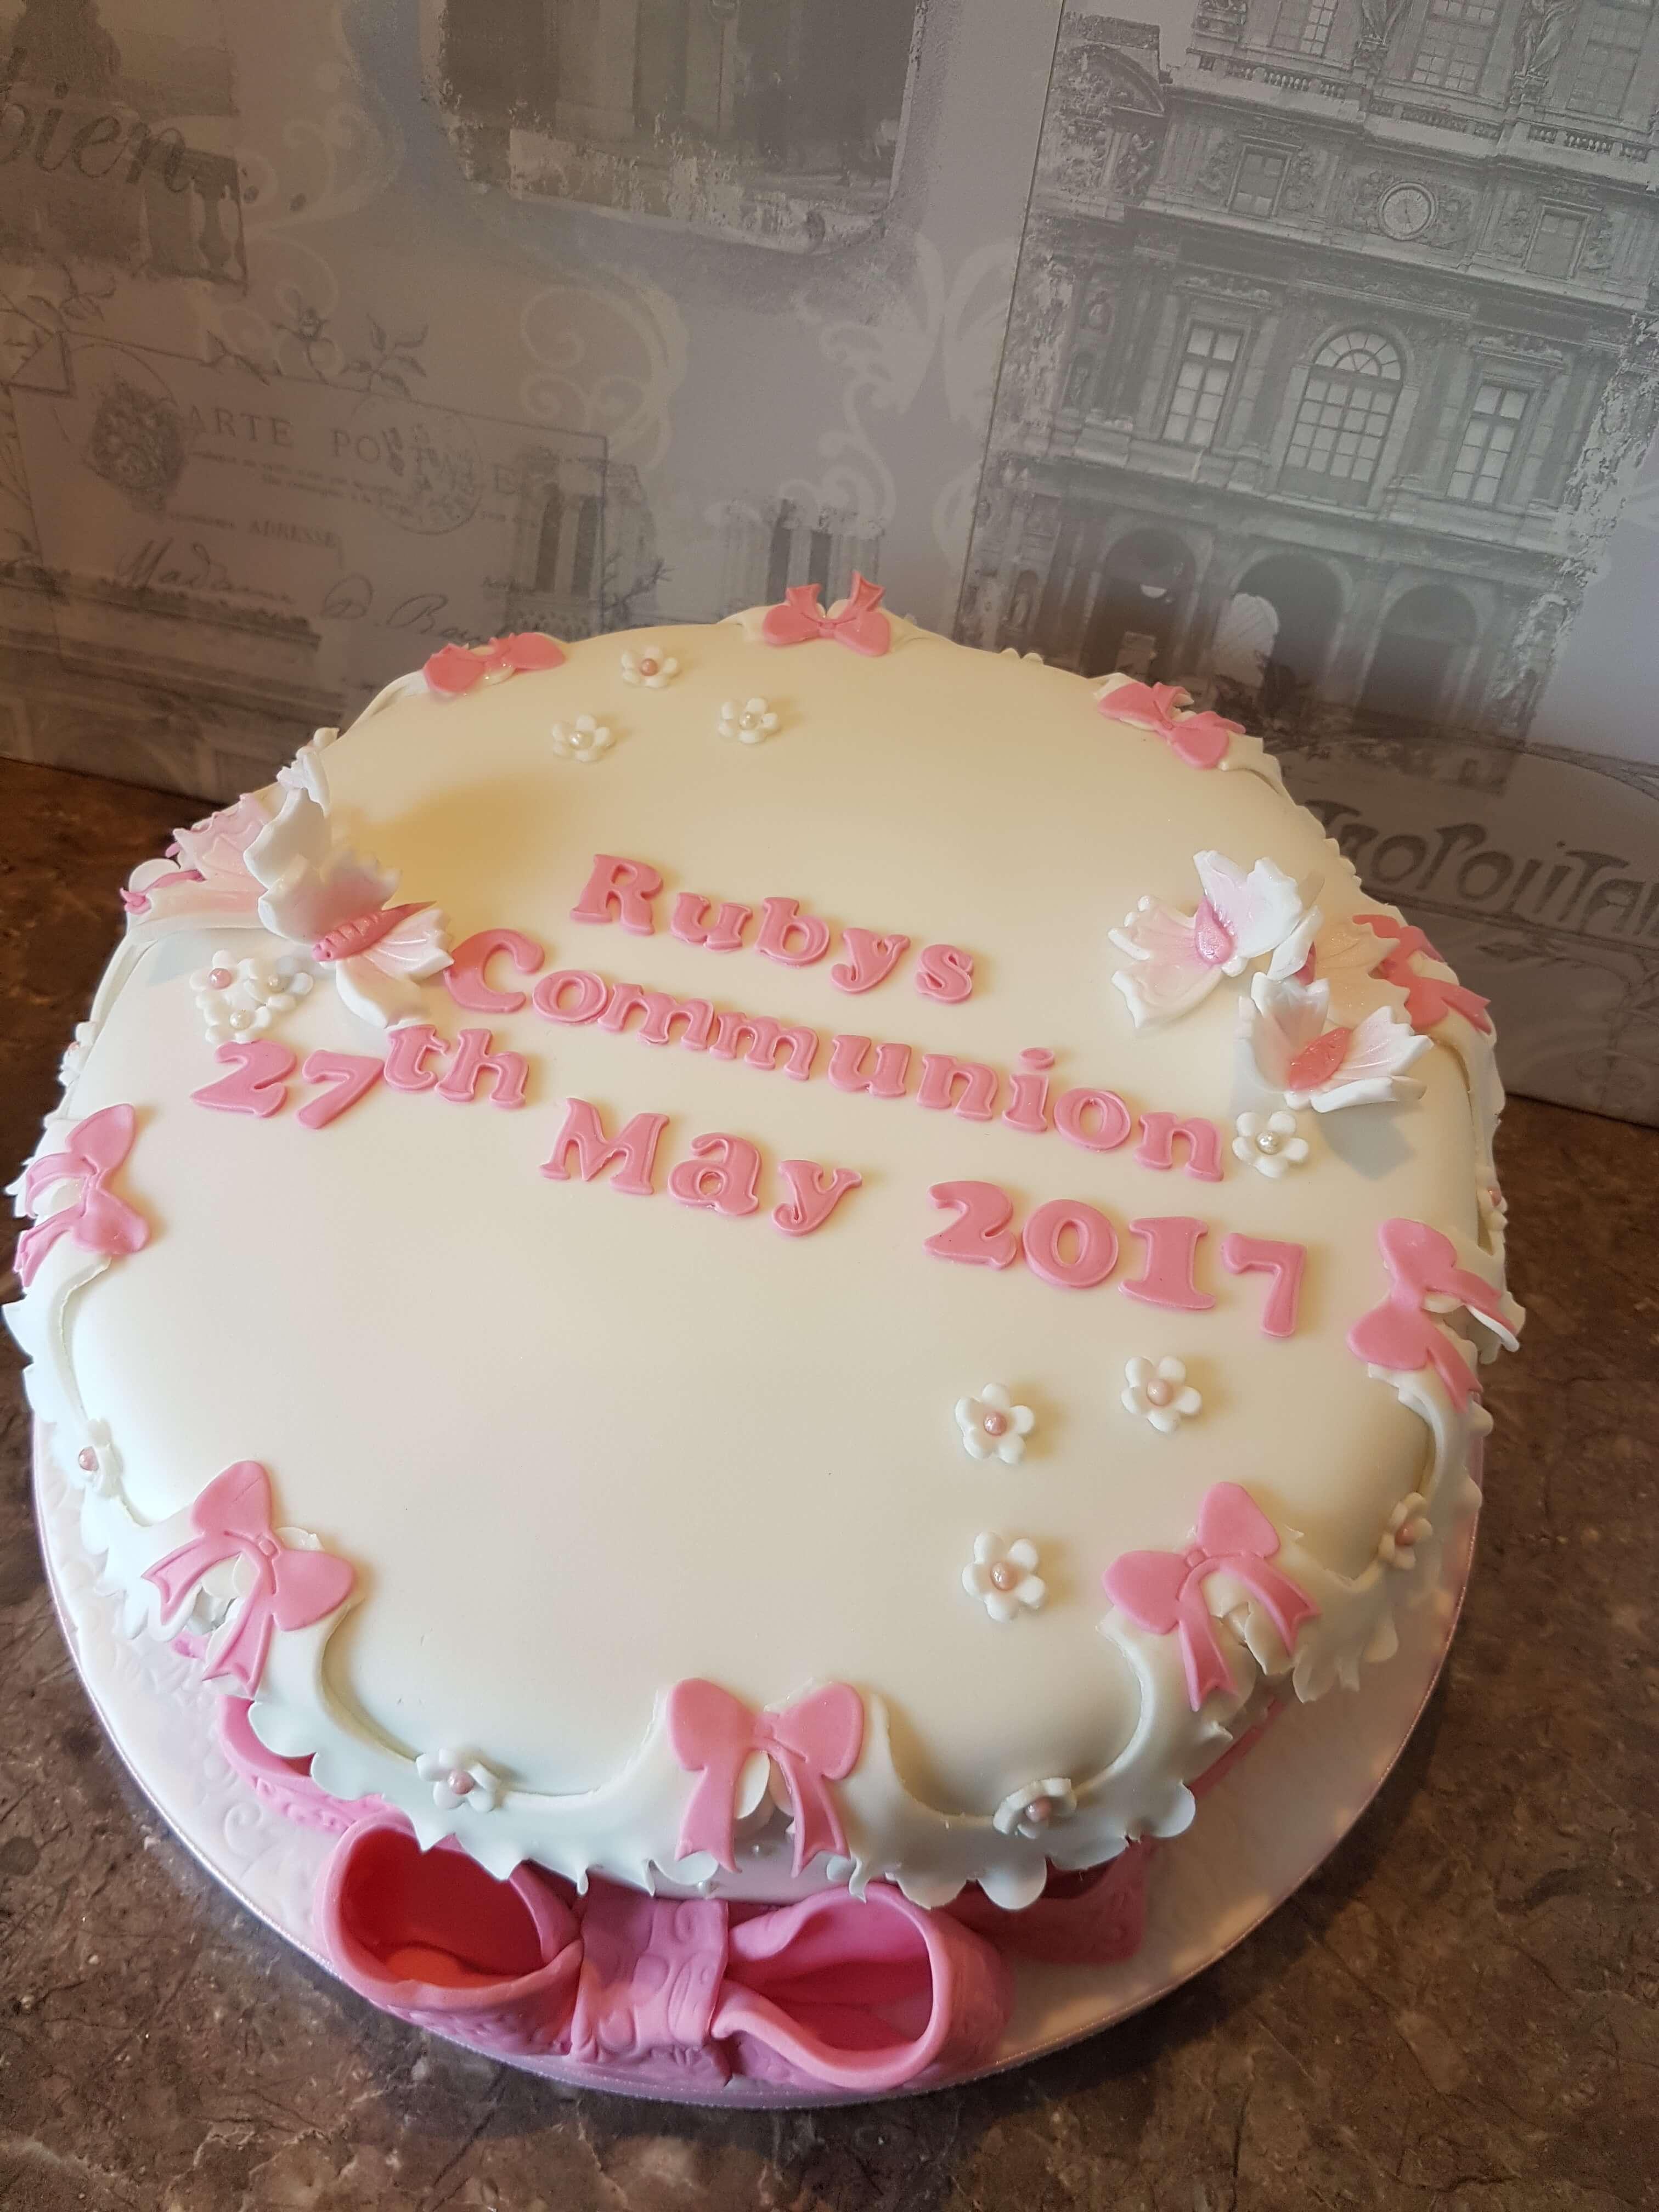 Bows & Butterflies Communion Cake